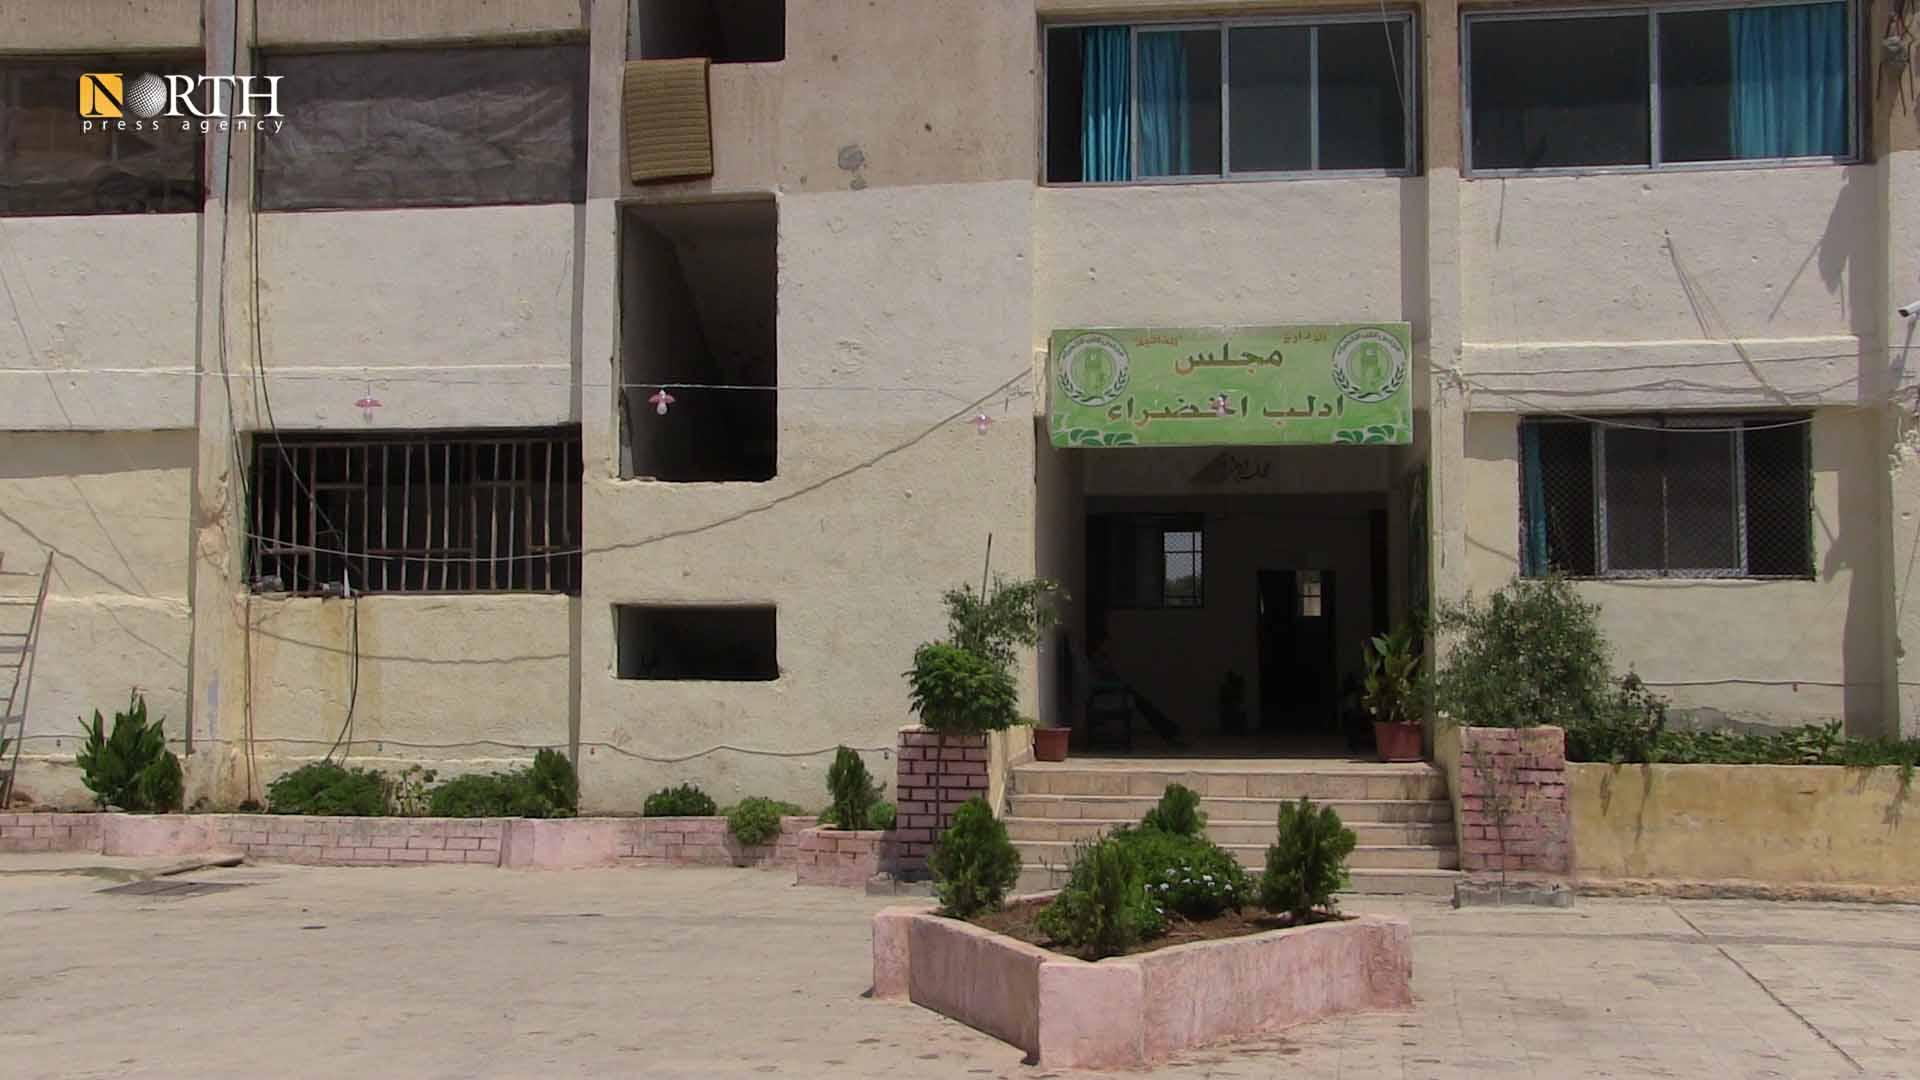 Idlib Council building in the city of Raqqa